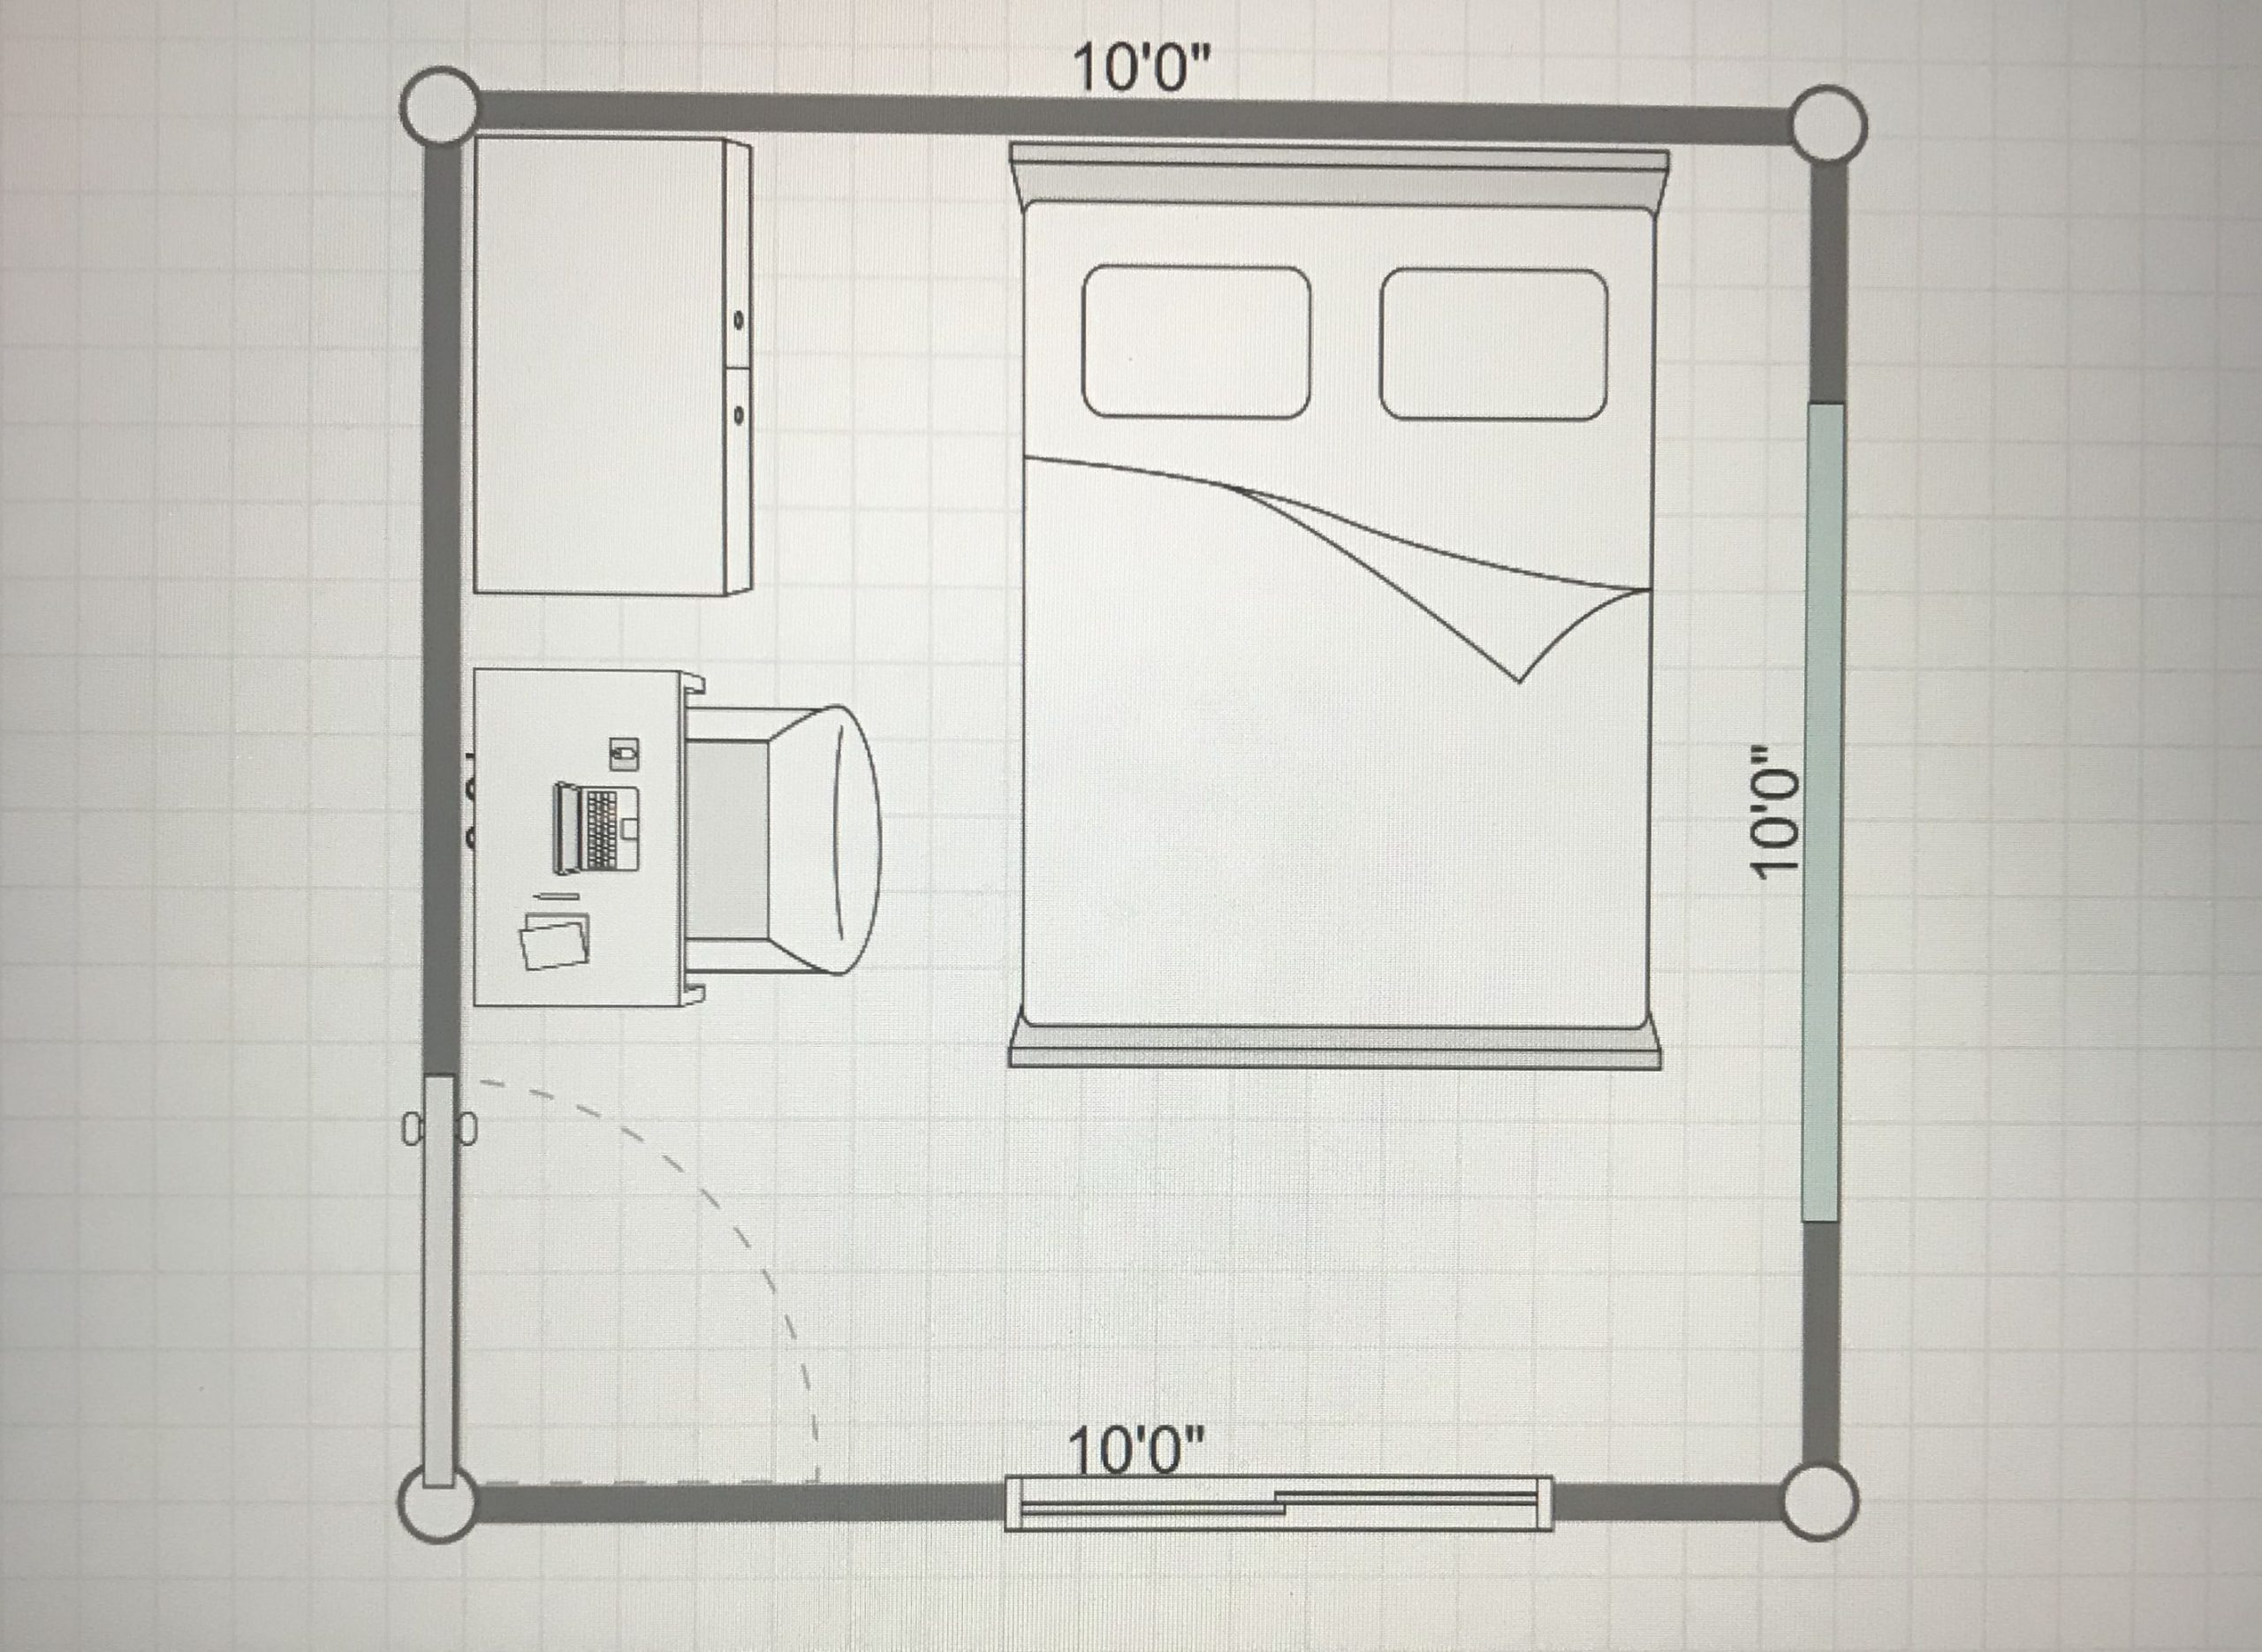 10x10 Bedroom Layout